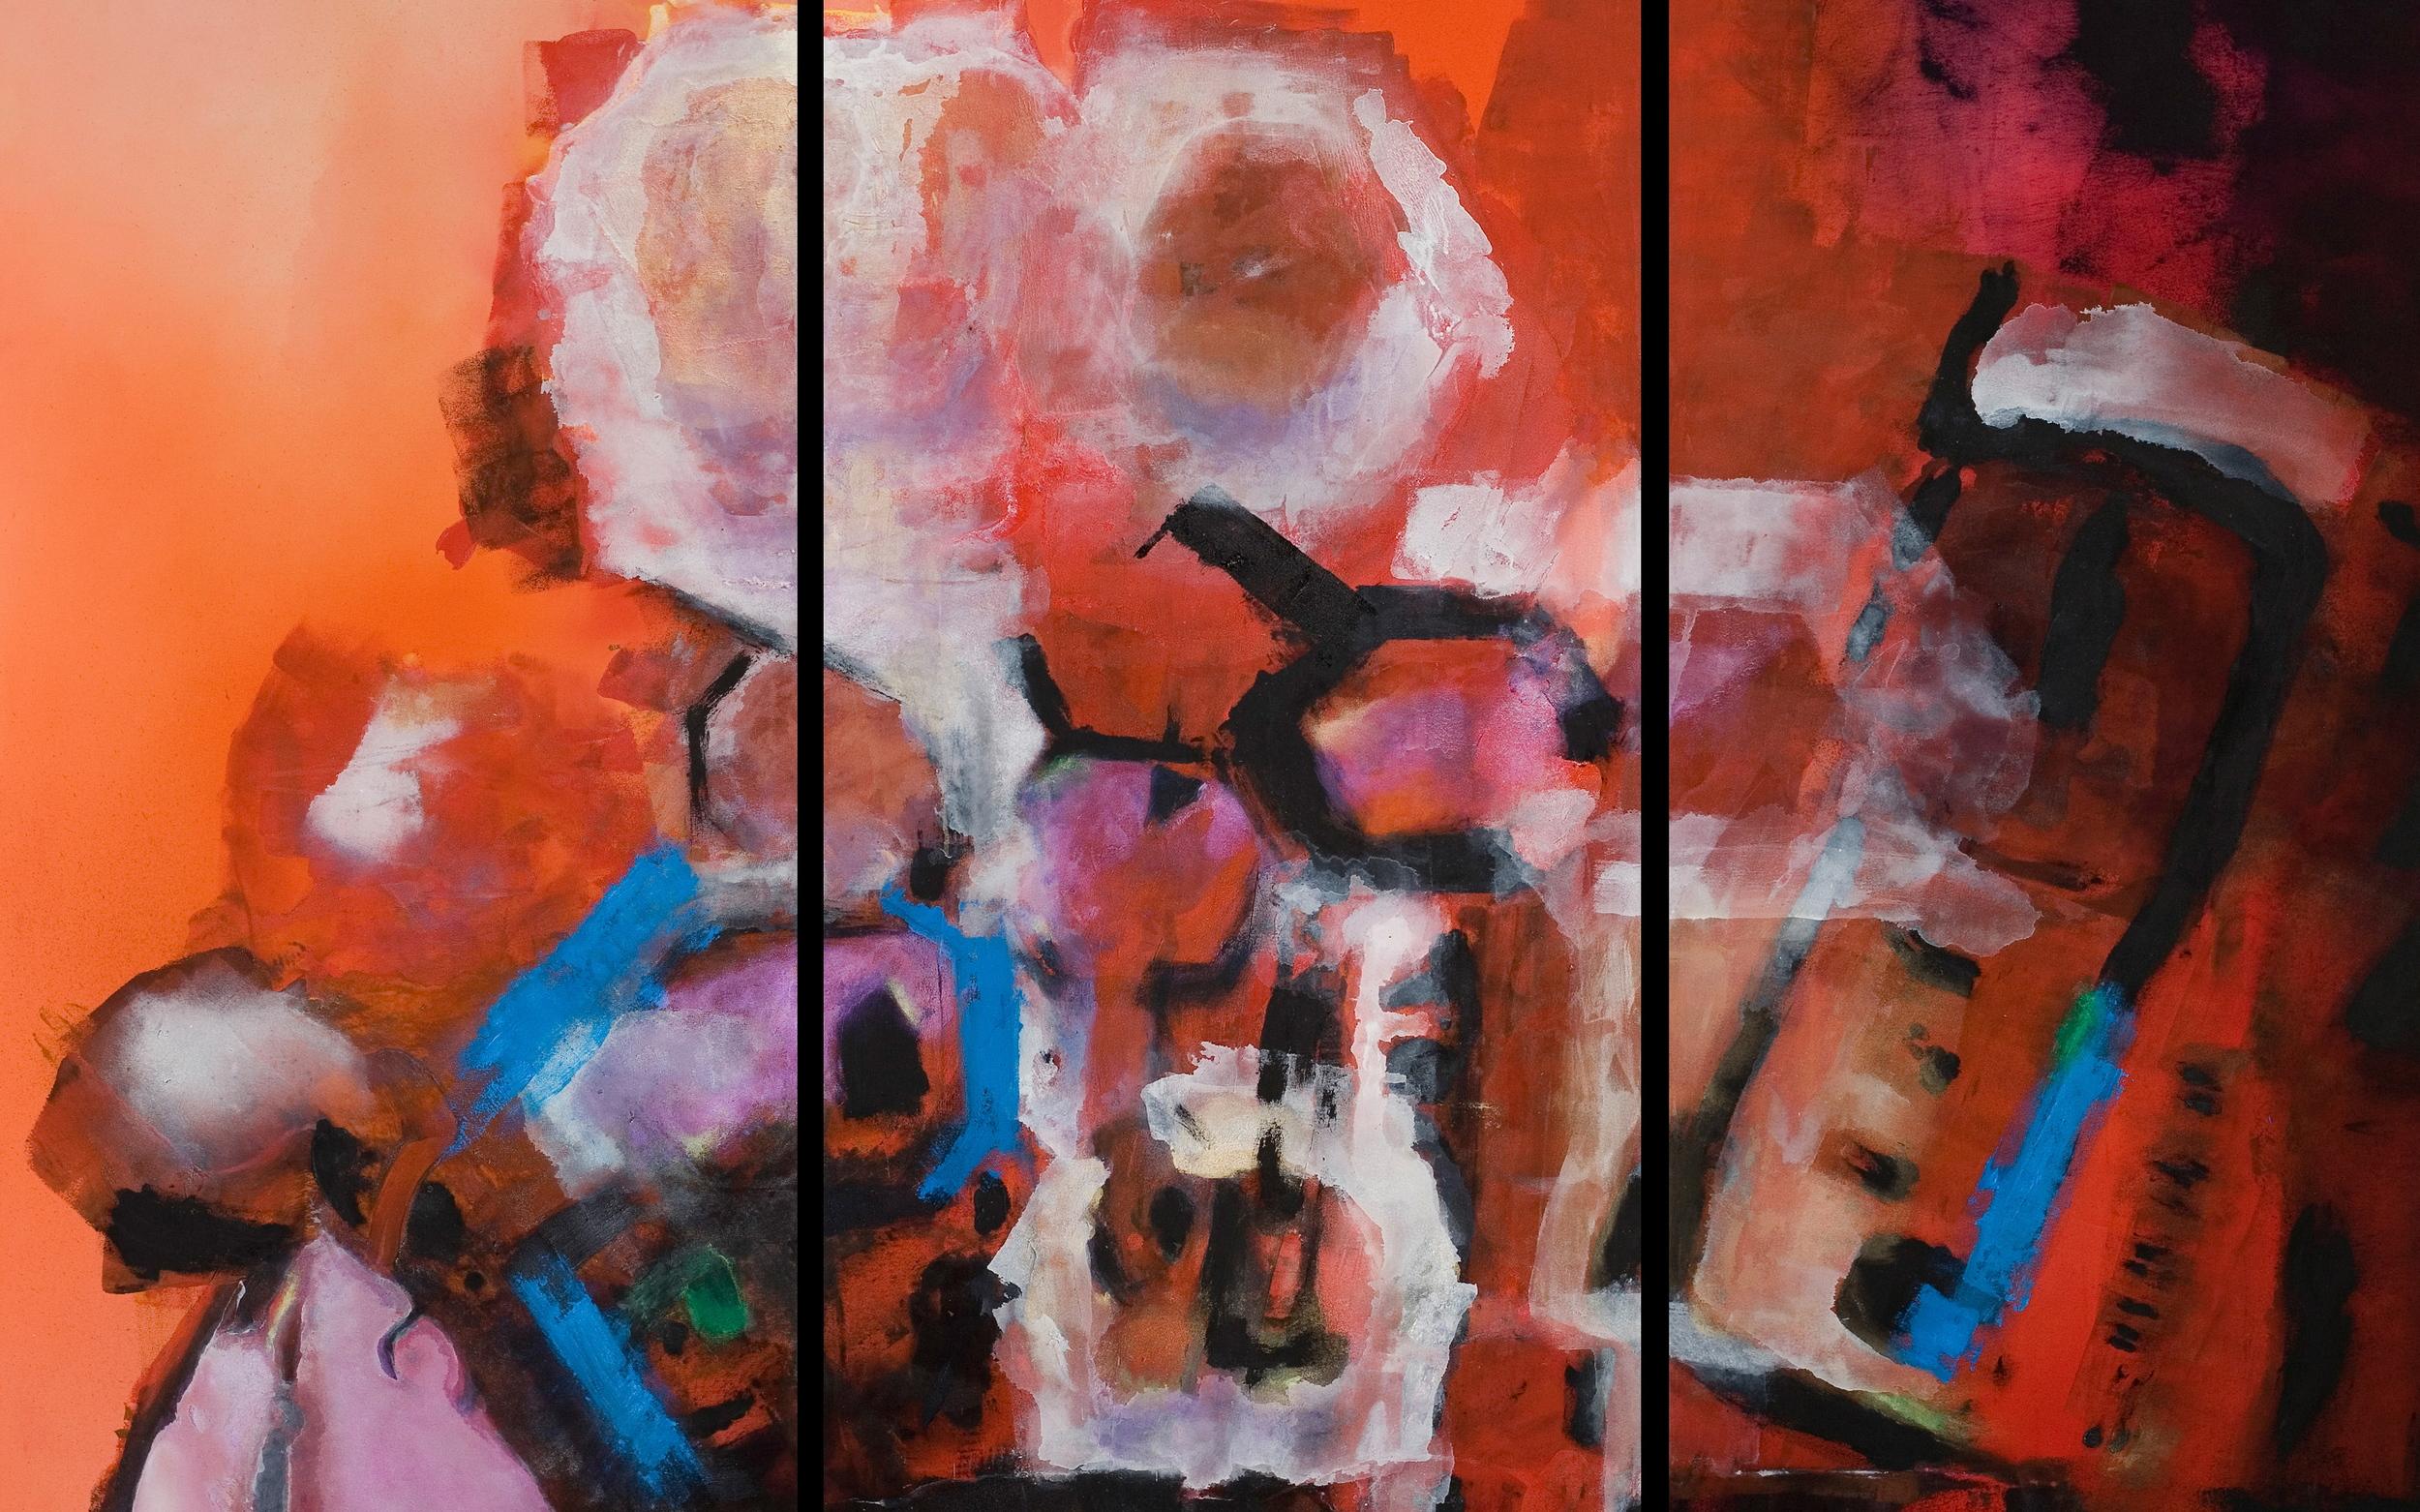 Collapse of the Colony. Margo Spellman/Studio Spellman